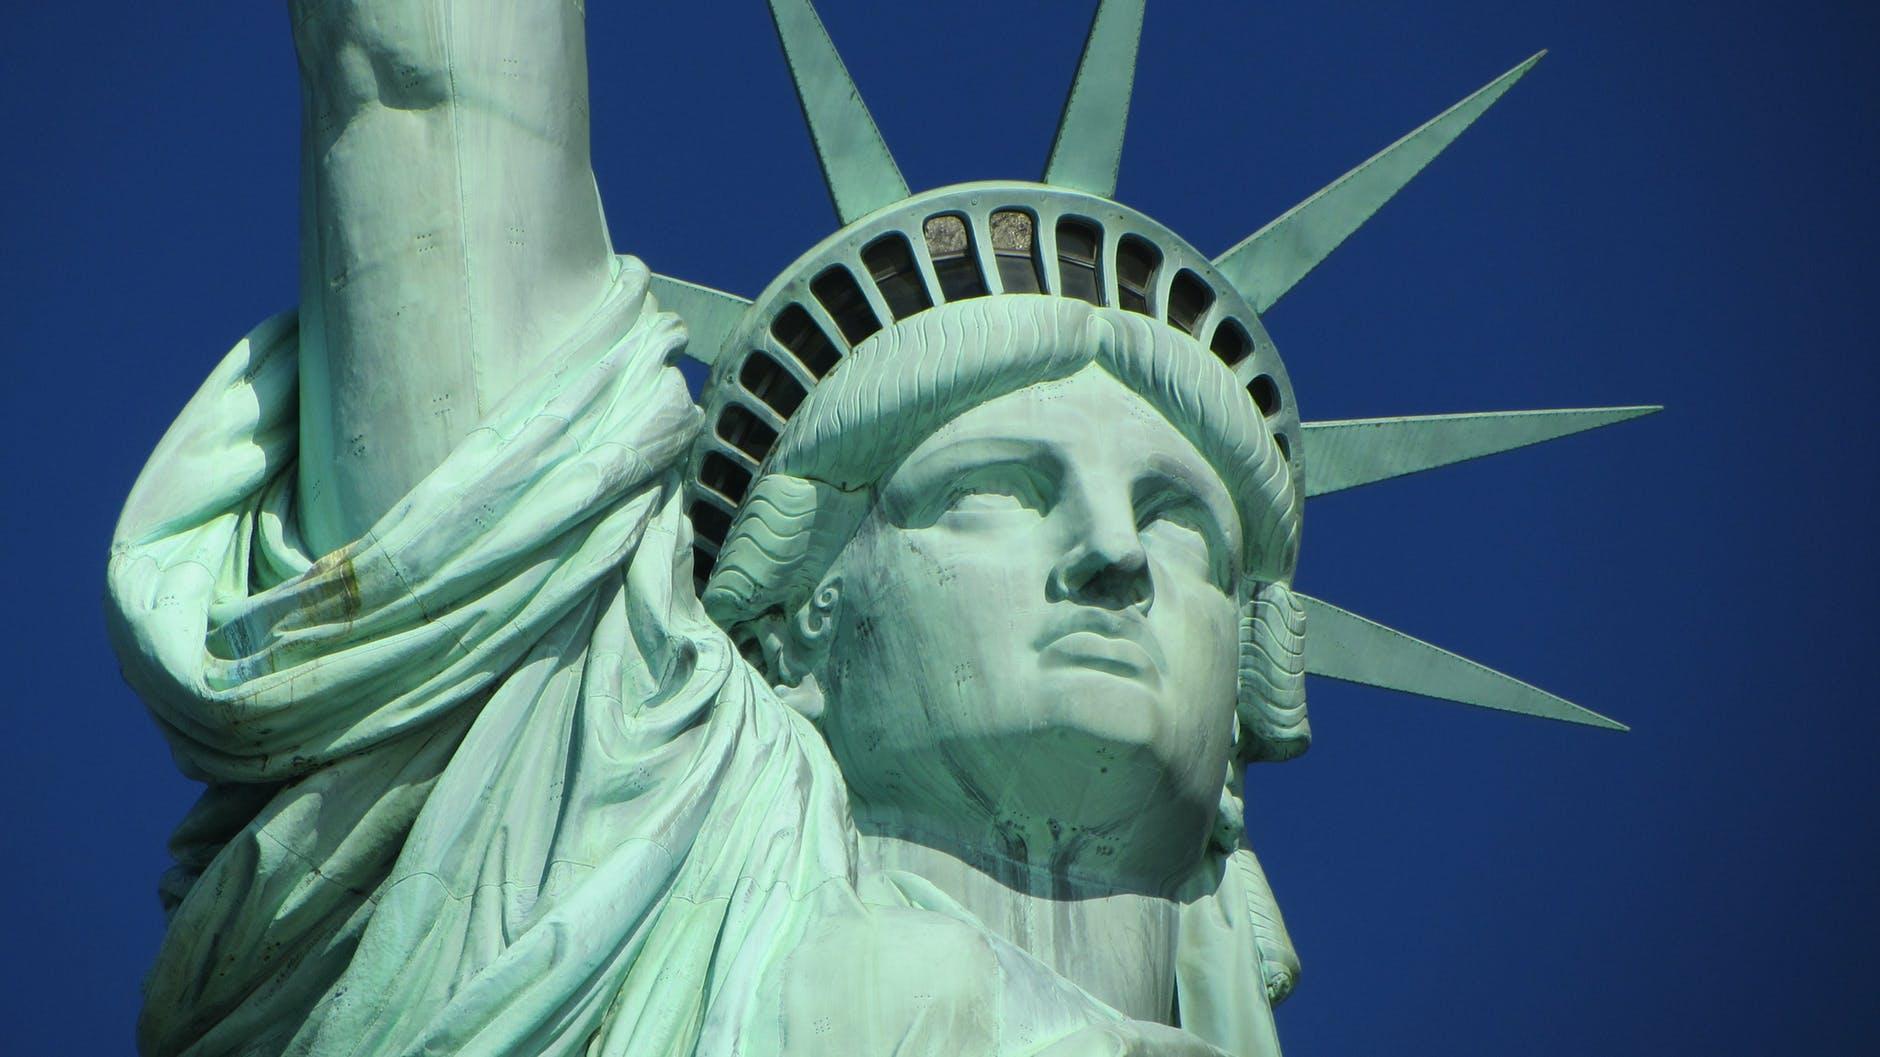 city new york statue of liberty usa